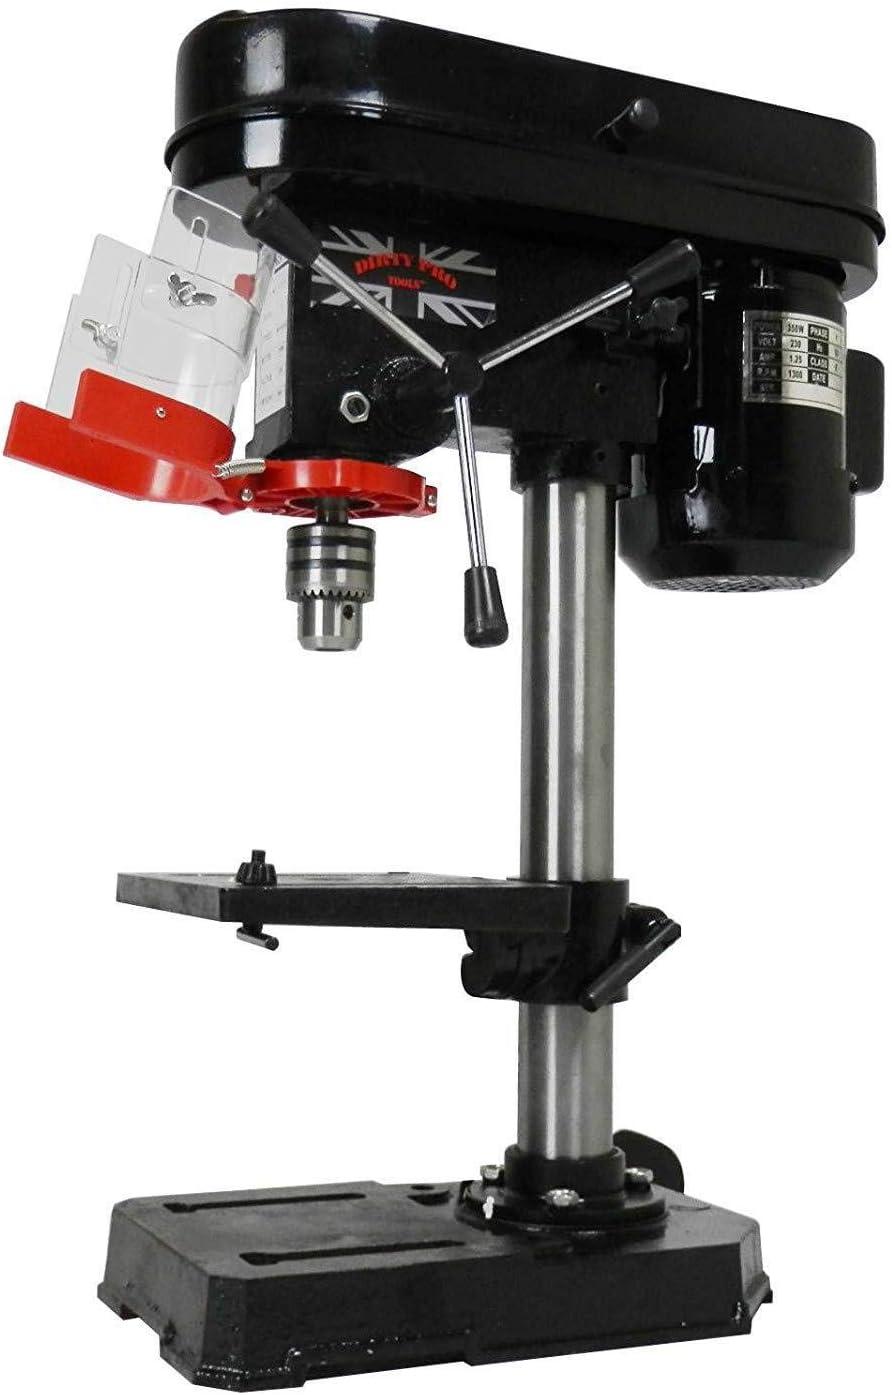 Benchtop Drill Press 9 Speed Pillar Drilling Stand 16mm Chuck Gauge Workbench UK